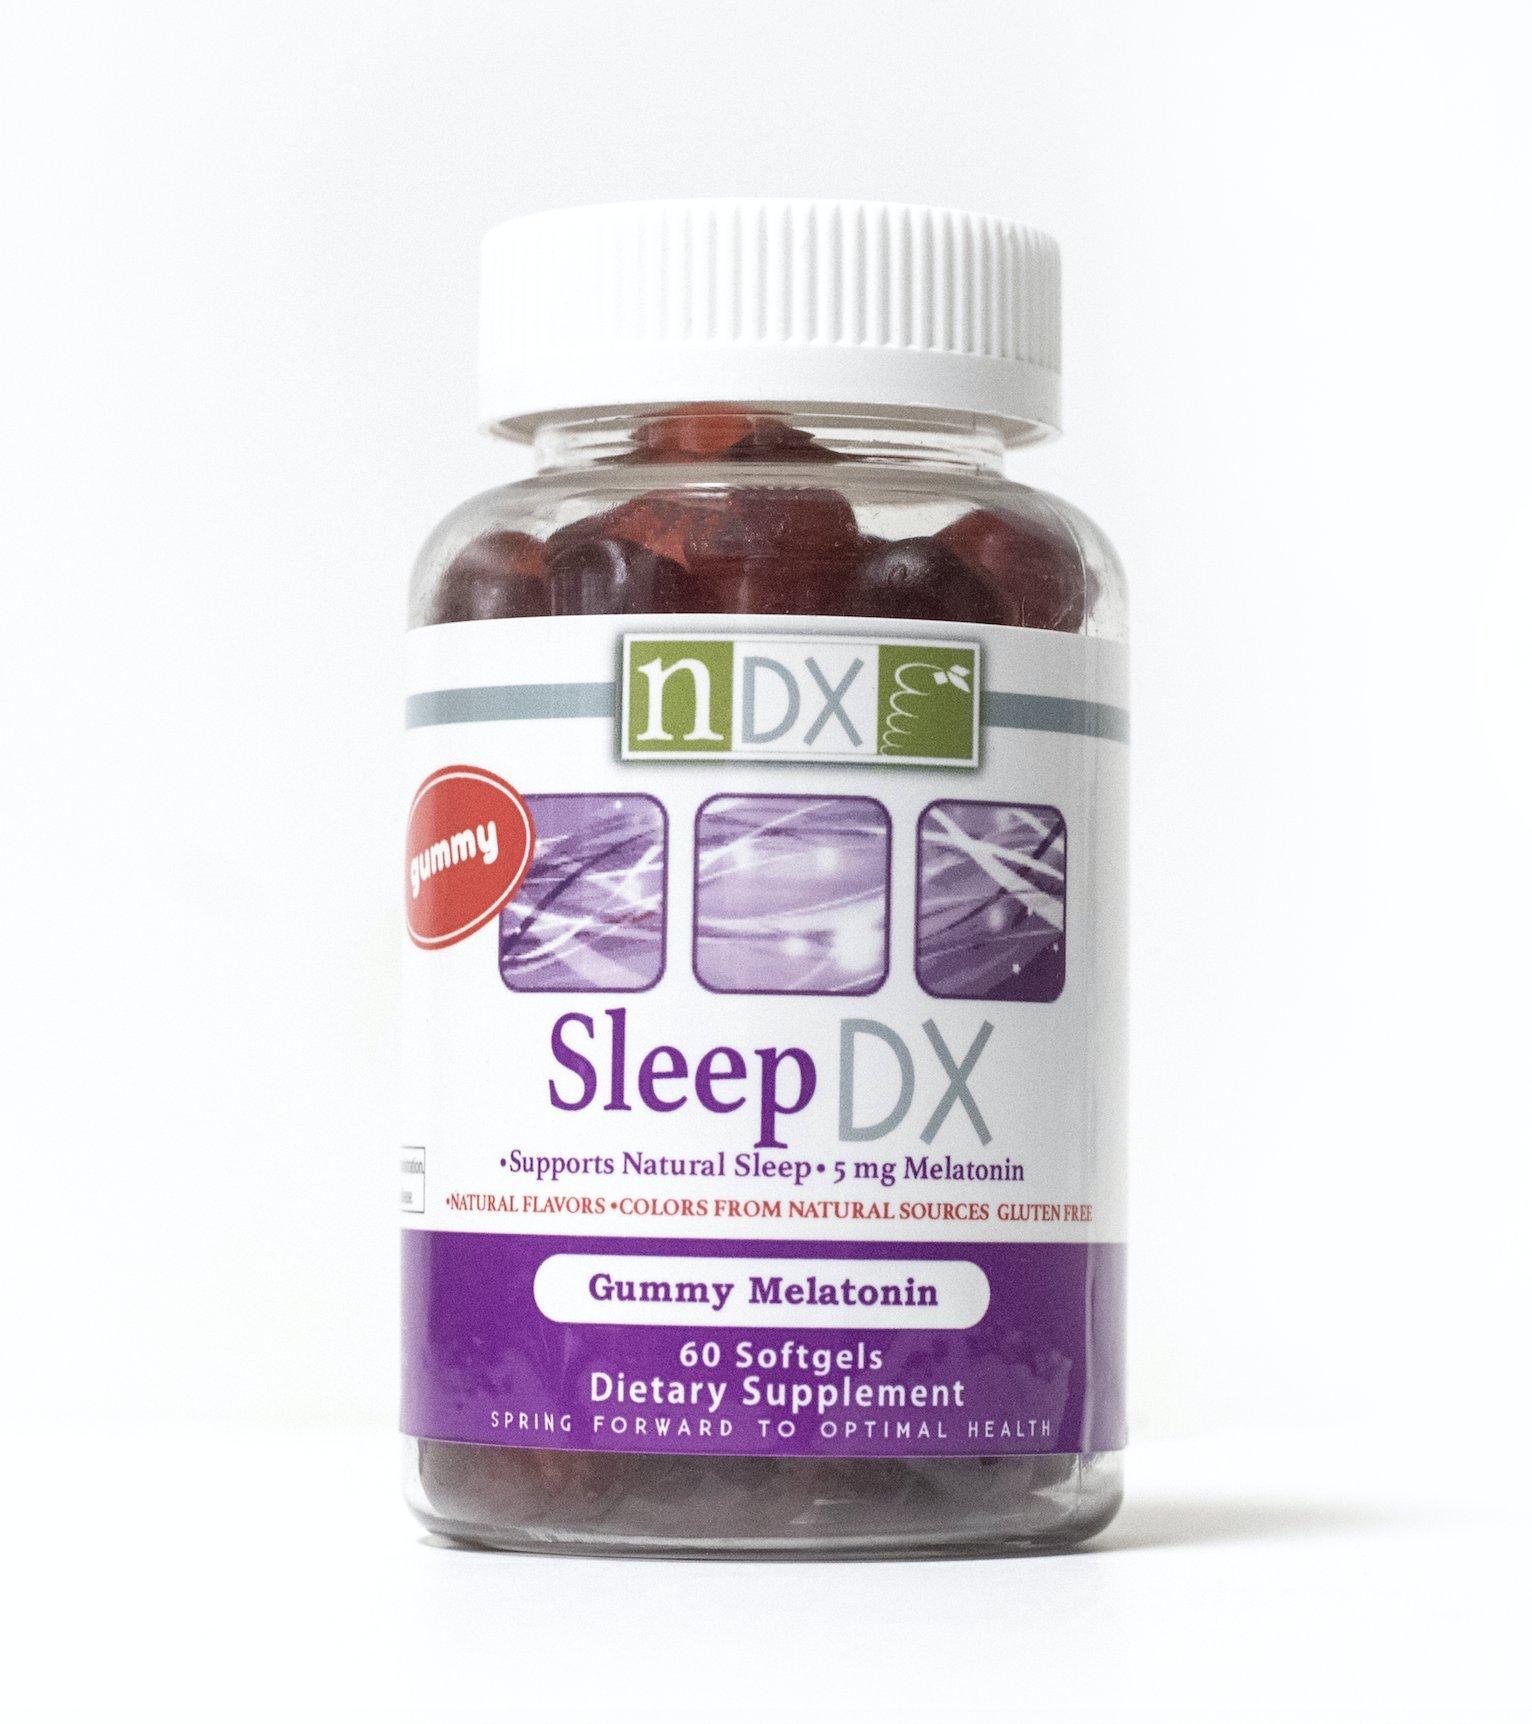 Sleep DX, Gummy Vitamin, Sleep Support, Supplement, Melatonin Gummies, Supports Natural Sleep, Gluten Free, Vegan, All Natural Ingredients (60)